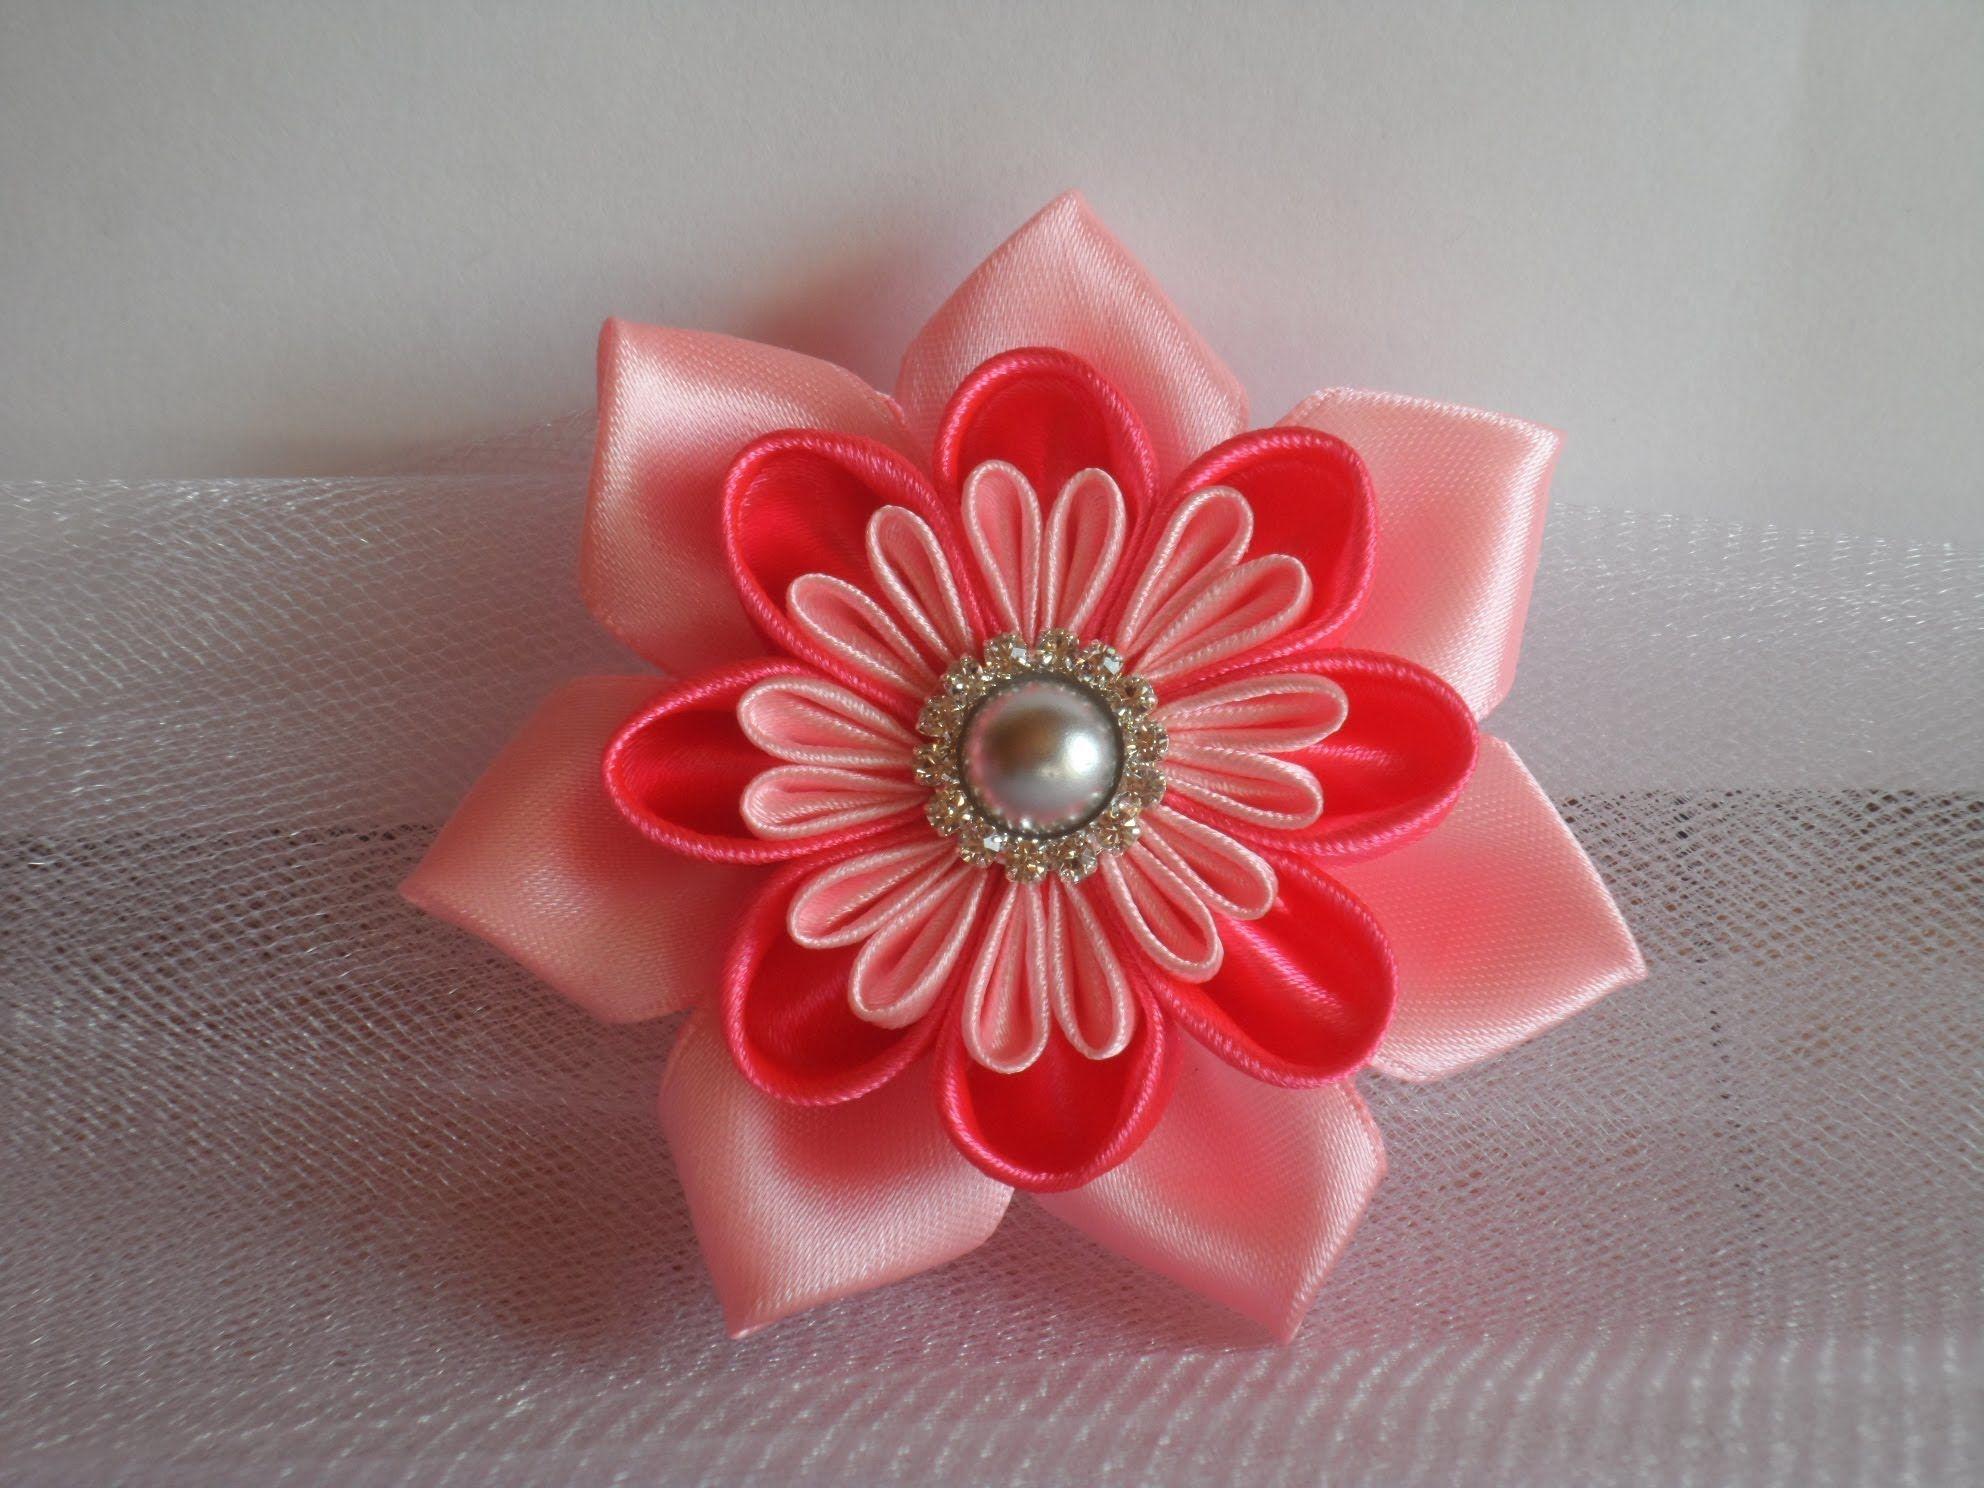 Заказать цветы из ленты мк канзаши, доставкой брянске